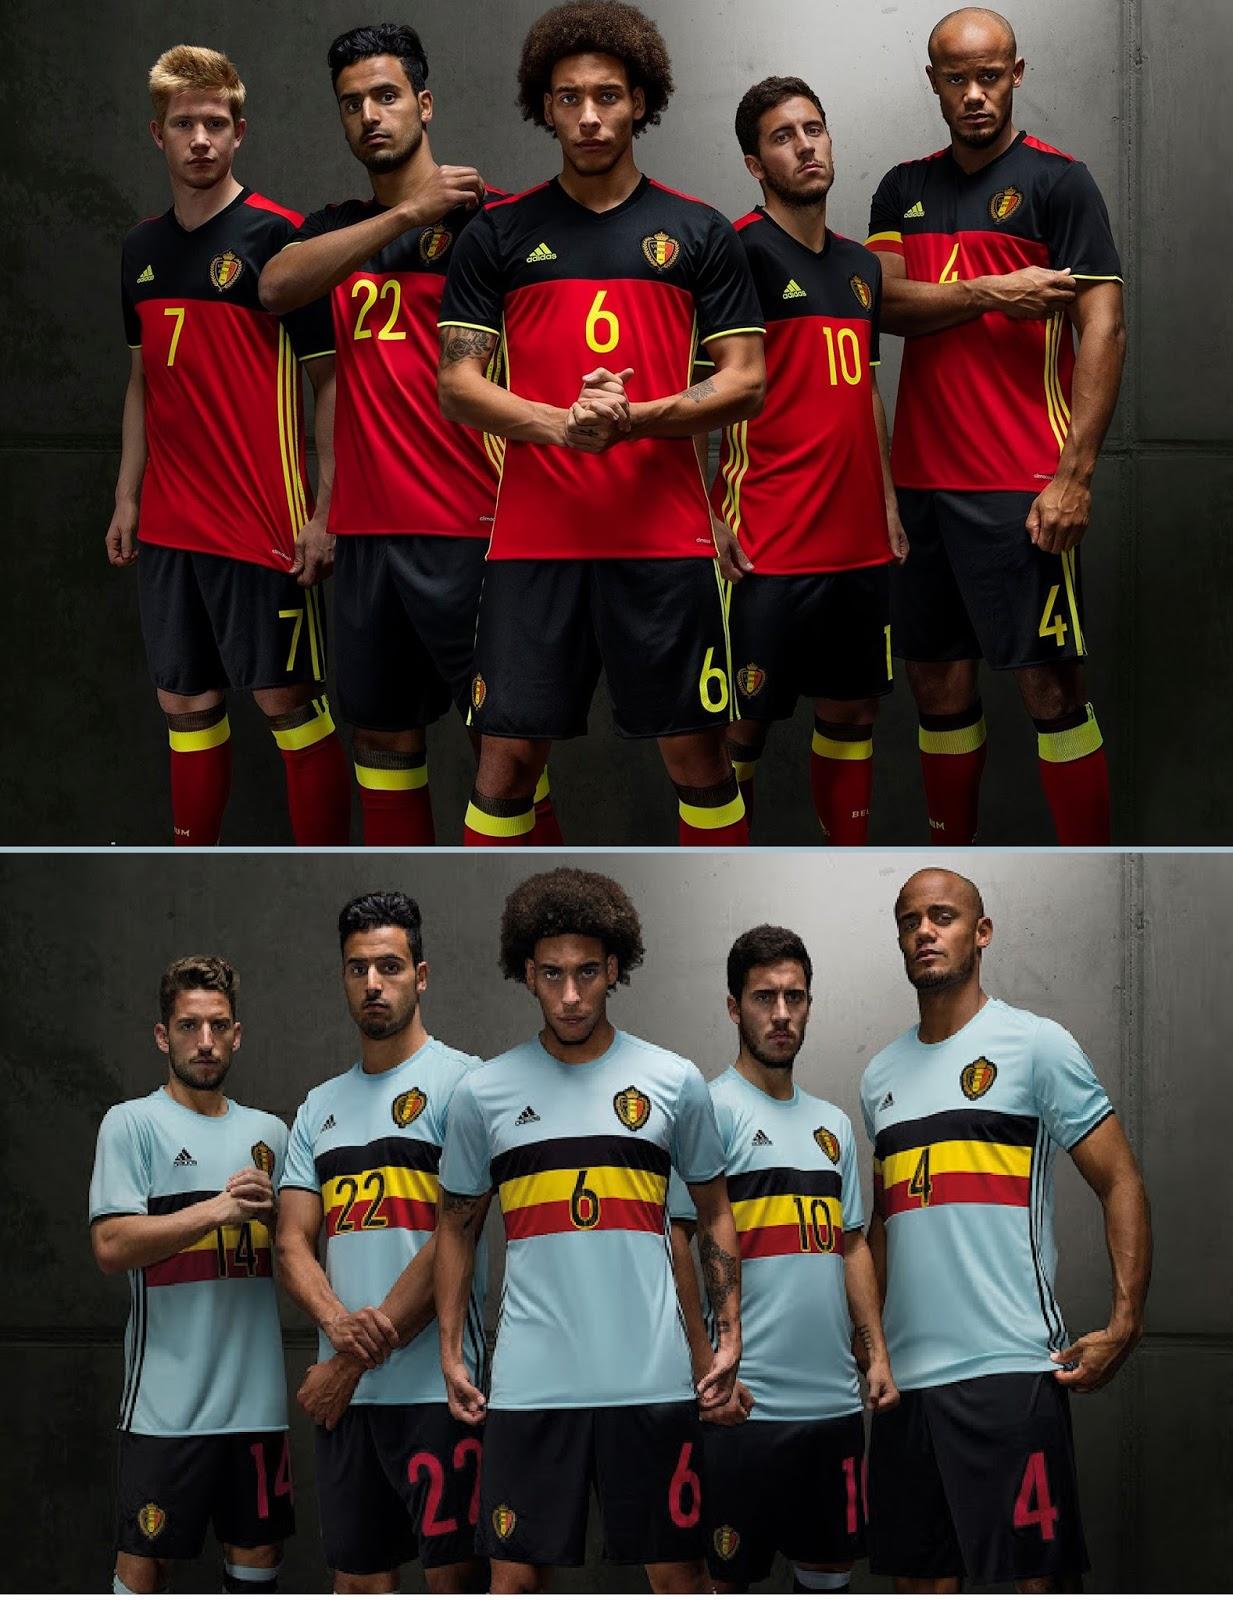 maglia belgio adidas